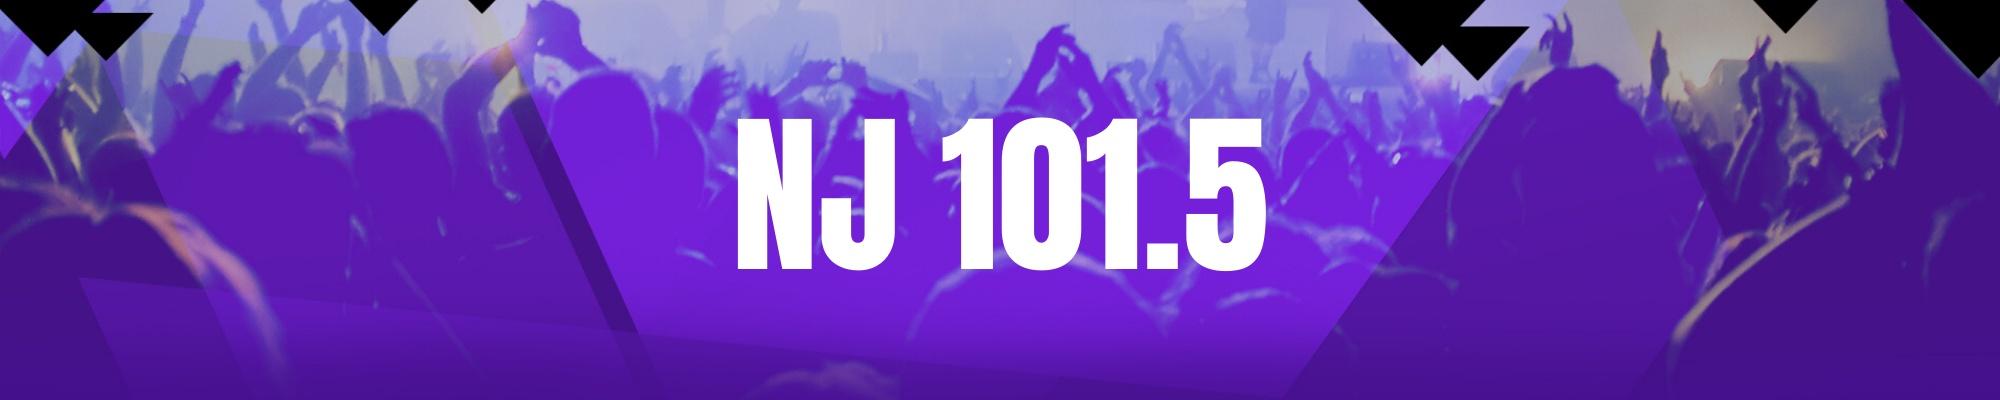 nj1015 Cover